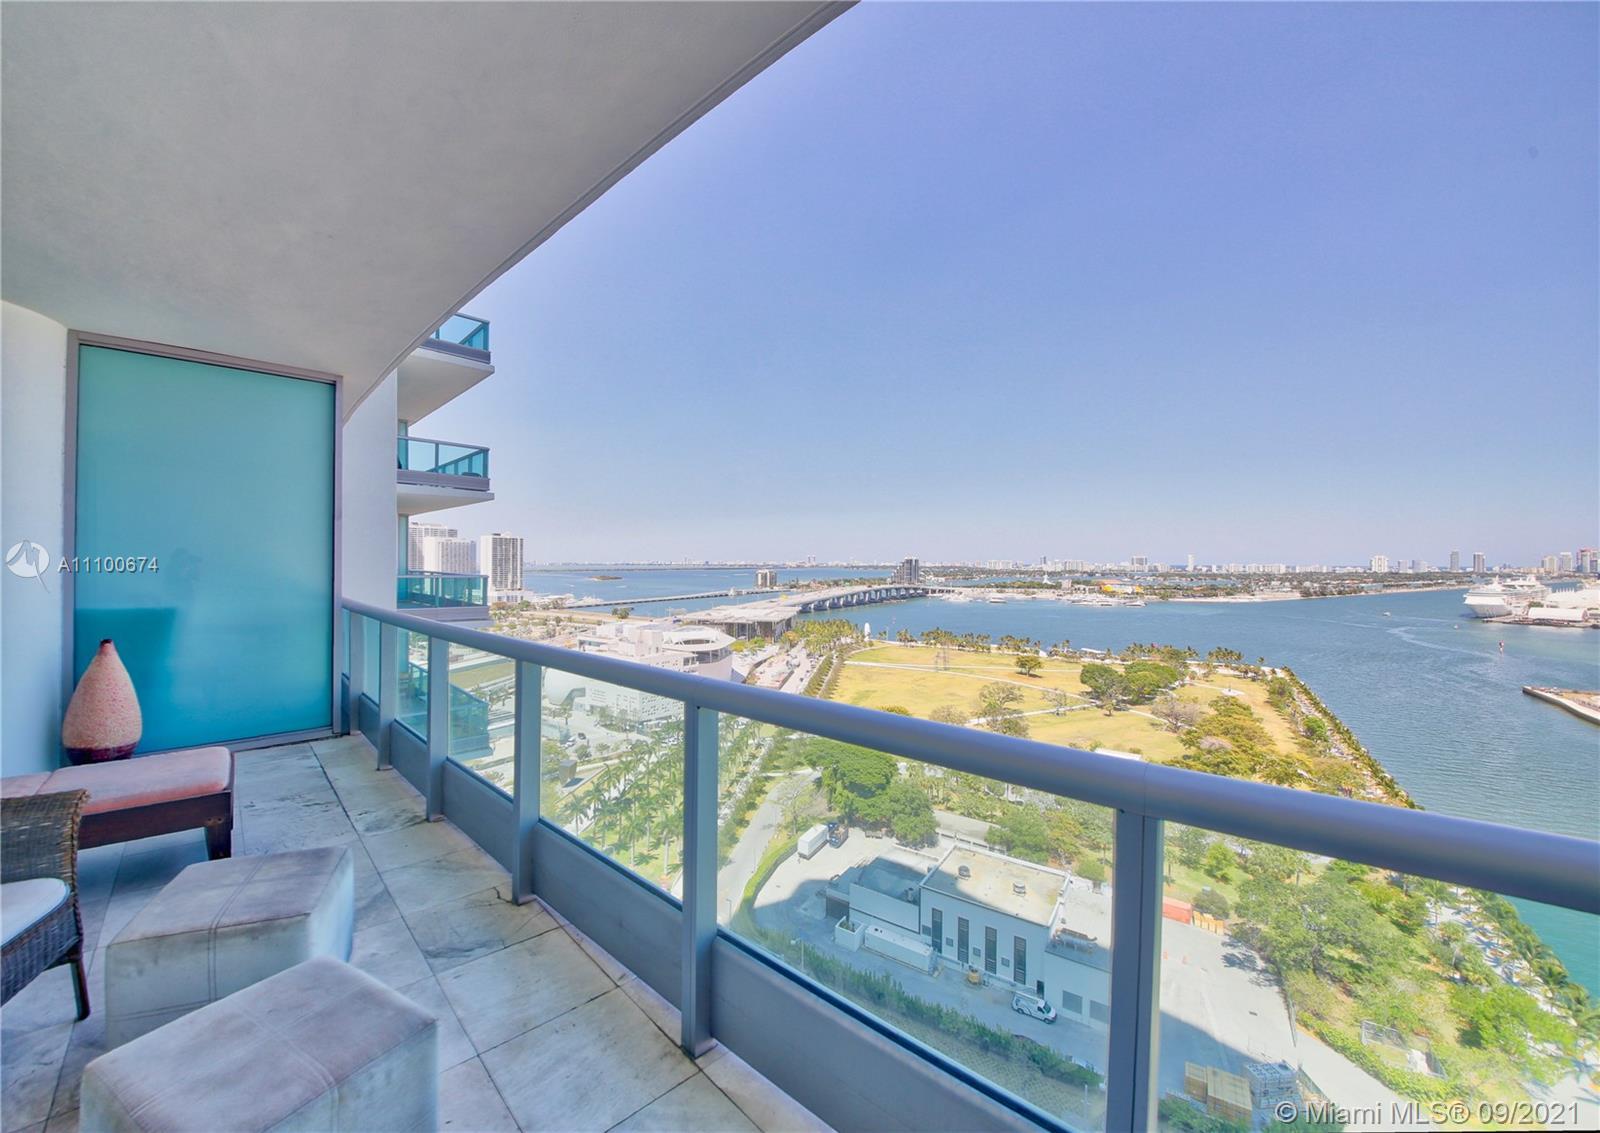 900 Biscayne Bay #2309 - 900 BISCAYNE BL #2309, Miami, FL 33132